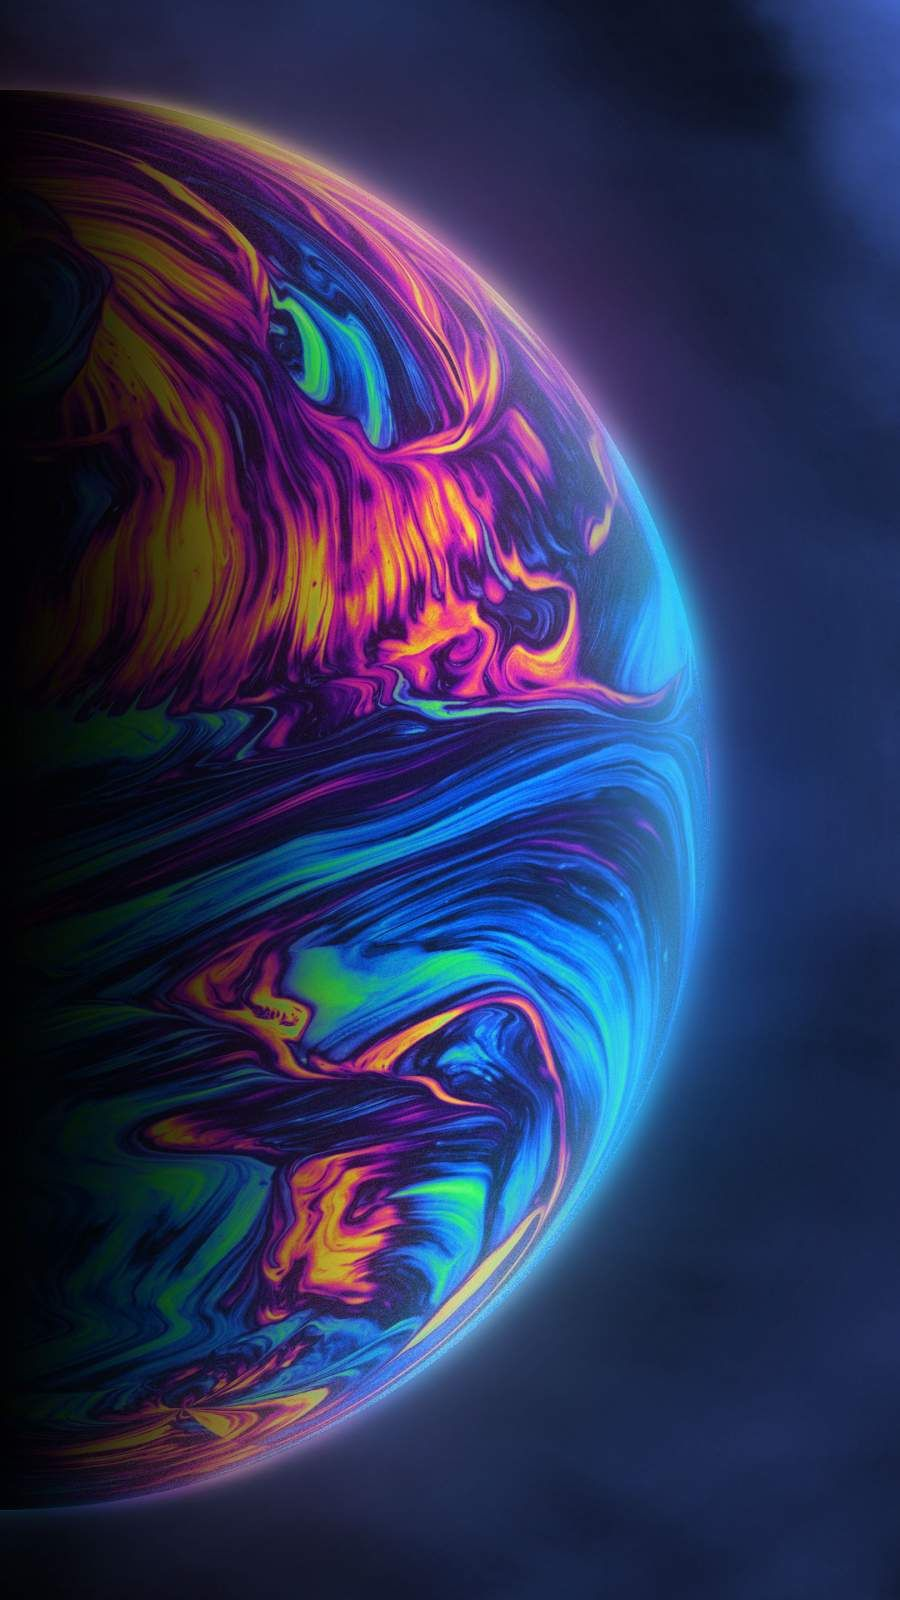 44+ Iphone planet wallpaper Download